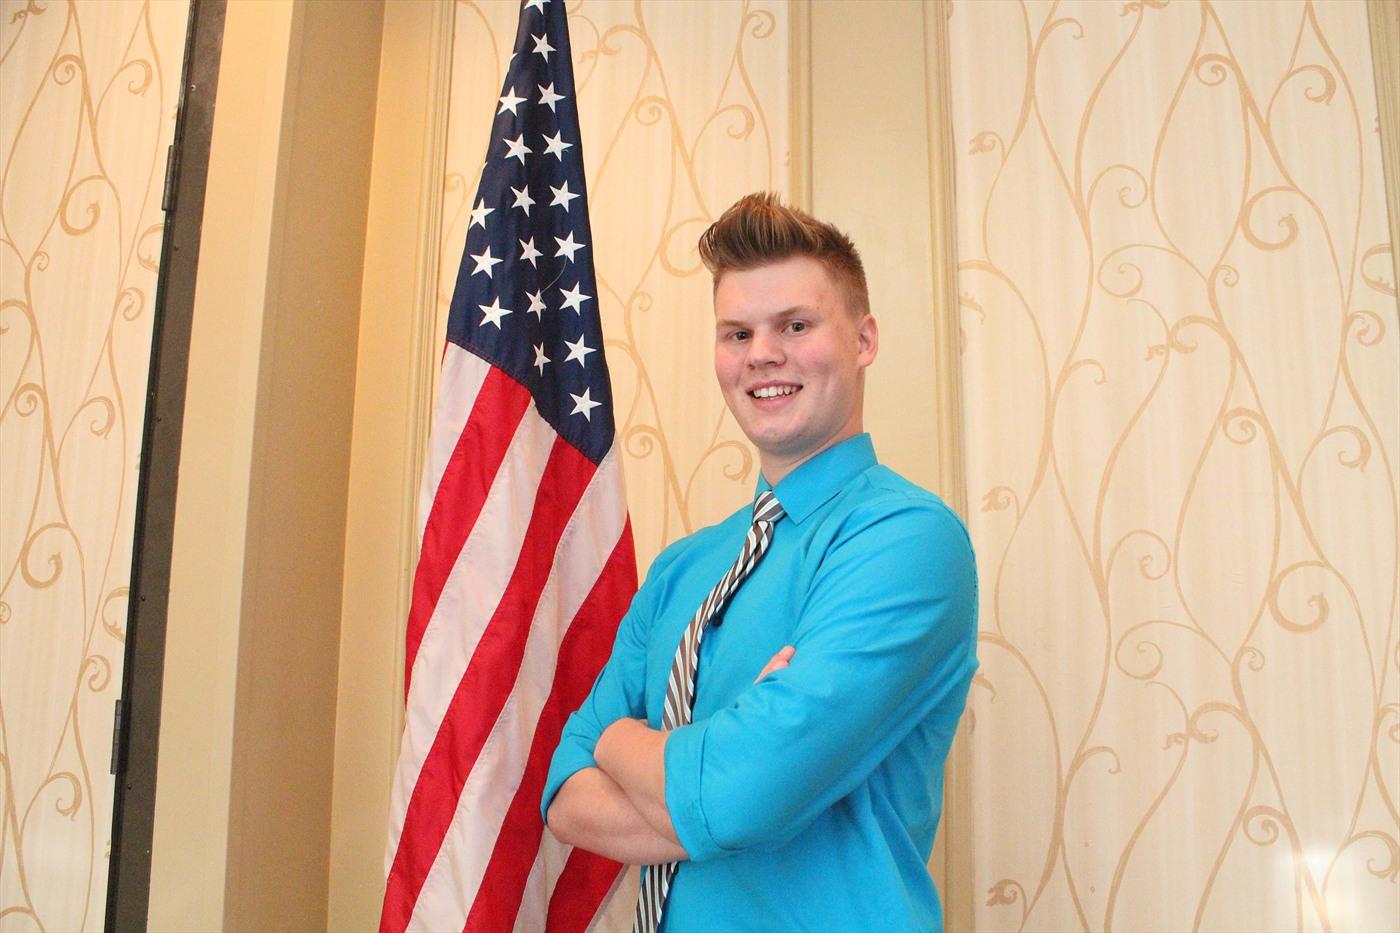 Tyler Bergeron of Pointe Coupee Parish wins the 2016 Talk Meet.